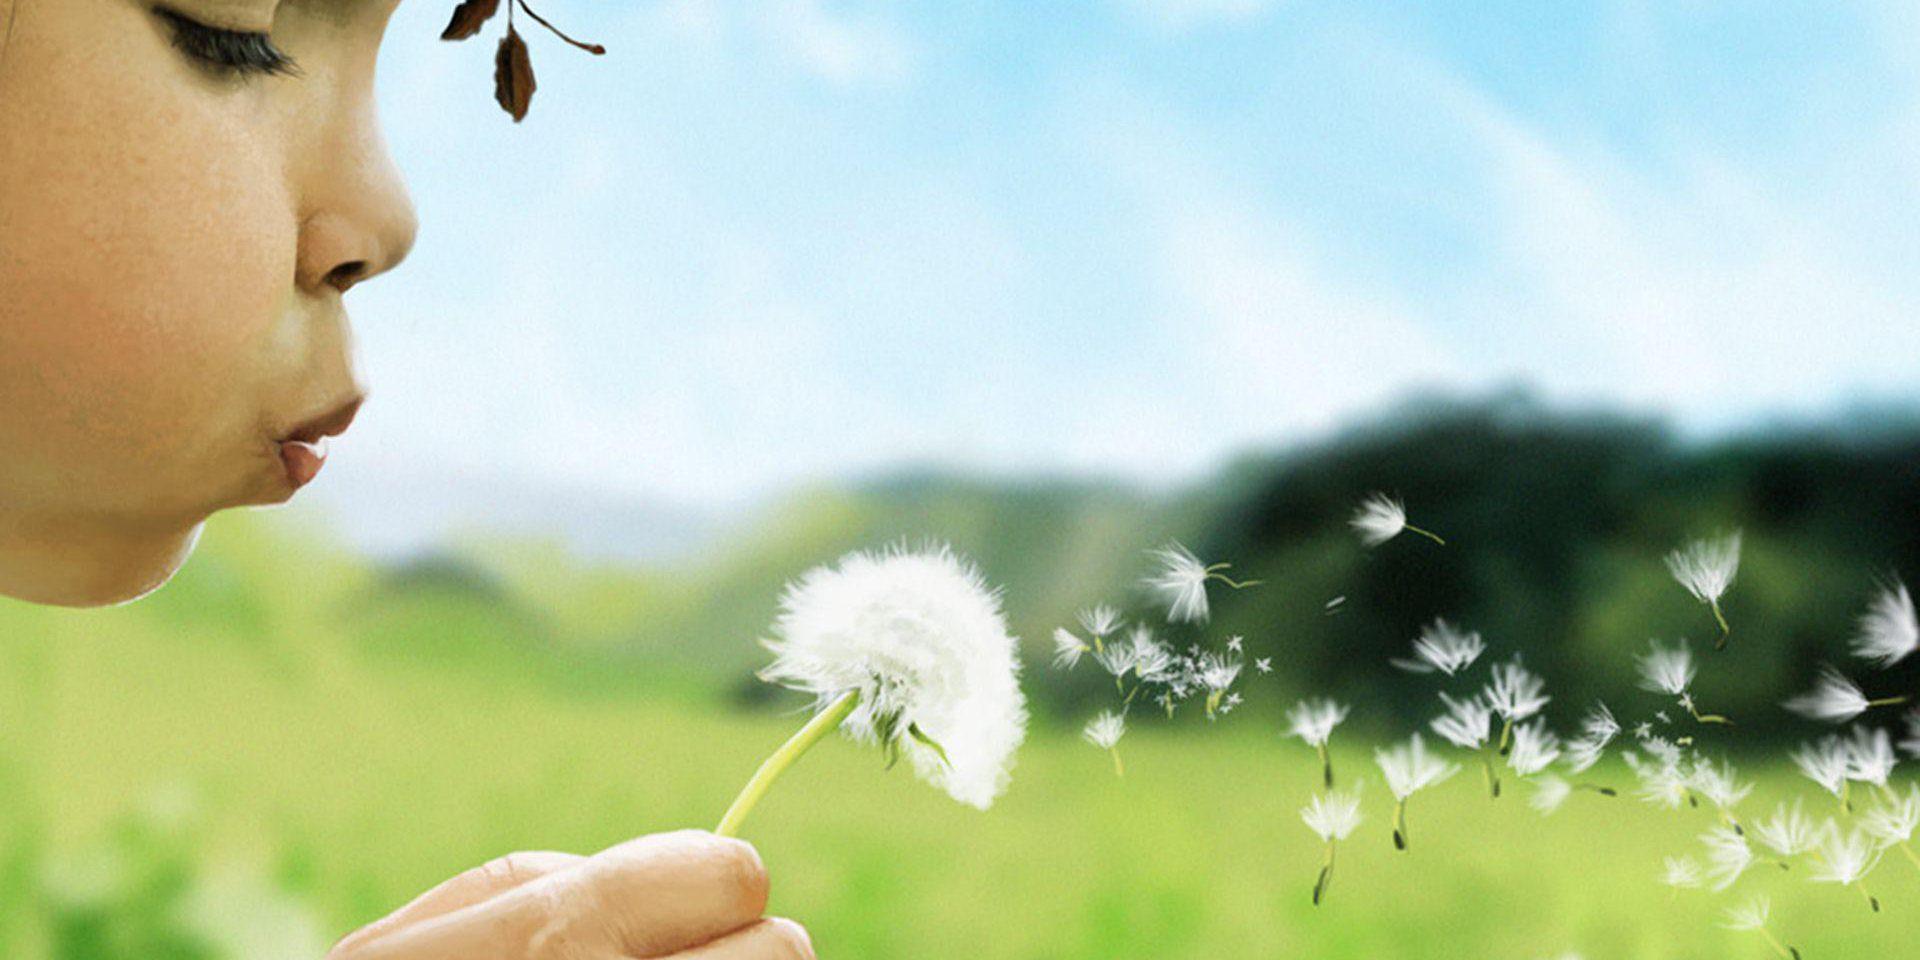 child-girl-blowing-dandelion-taraxacum-flower